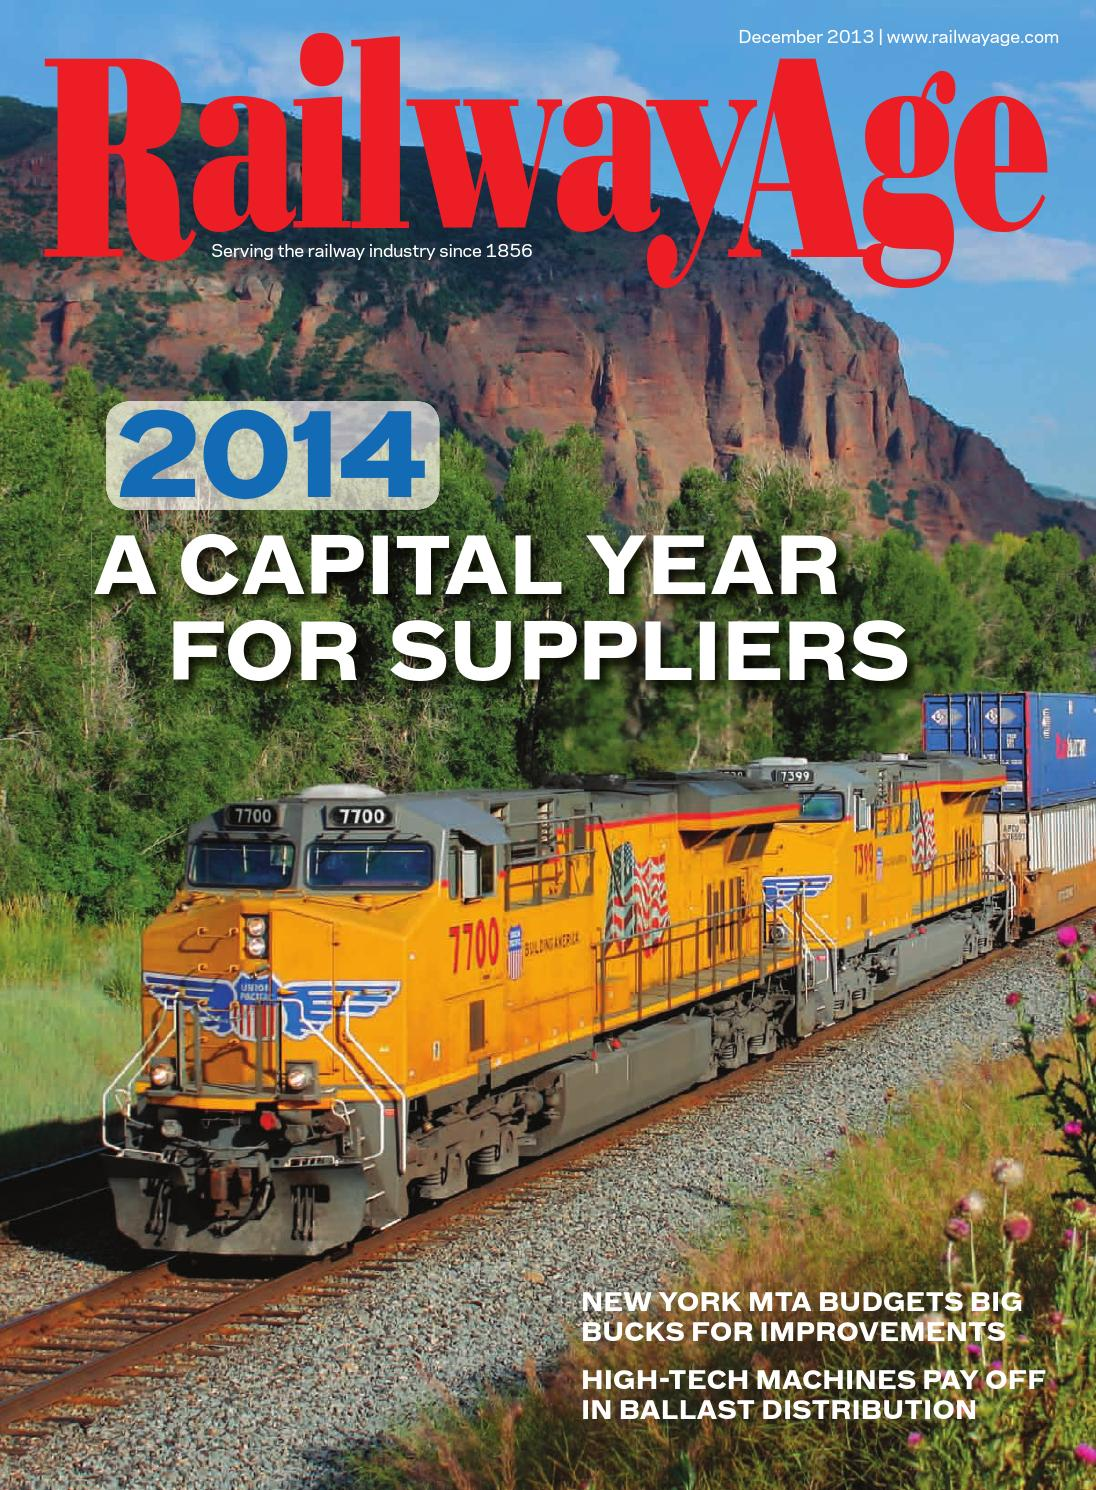 December 2013 Railway Age Magazine by Railway Age - issuu